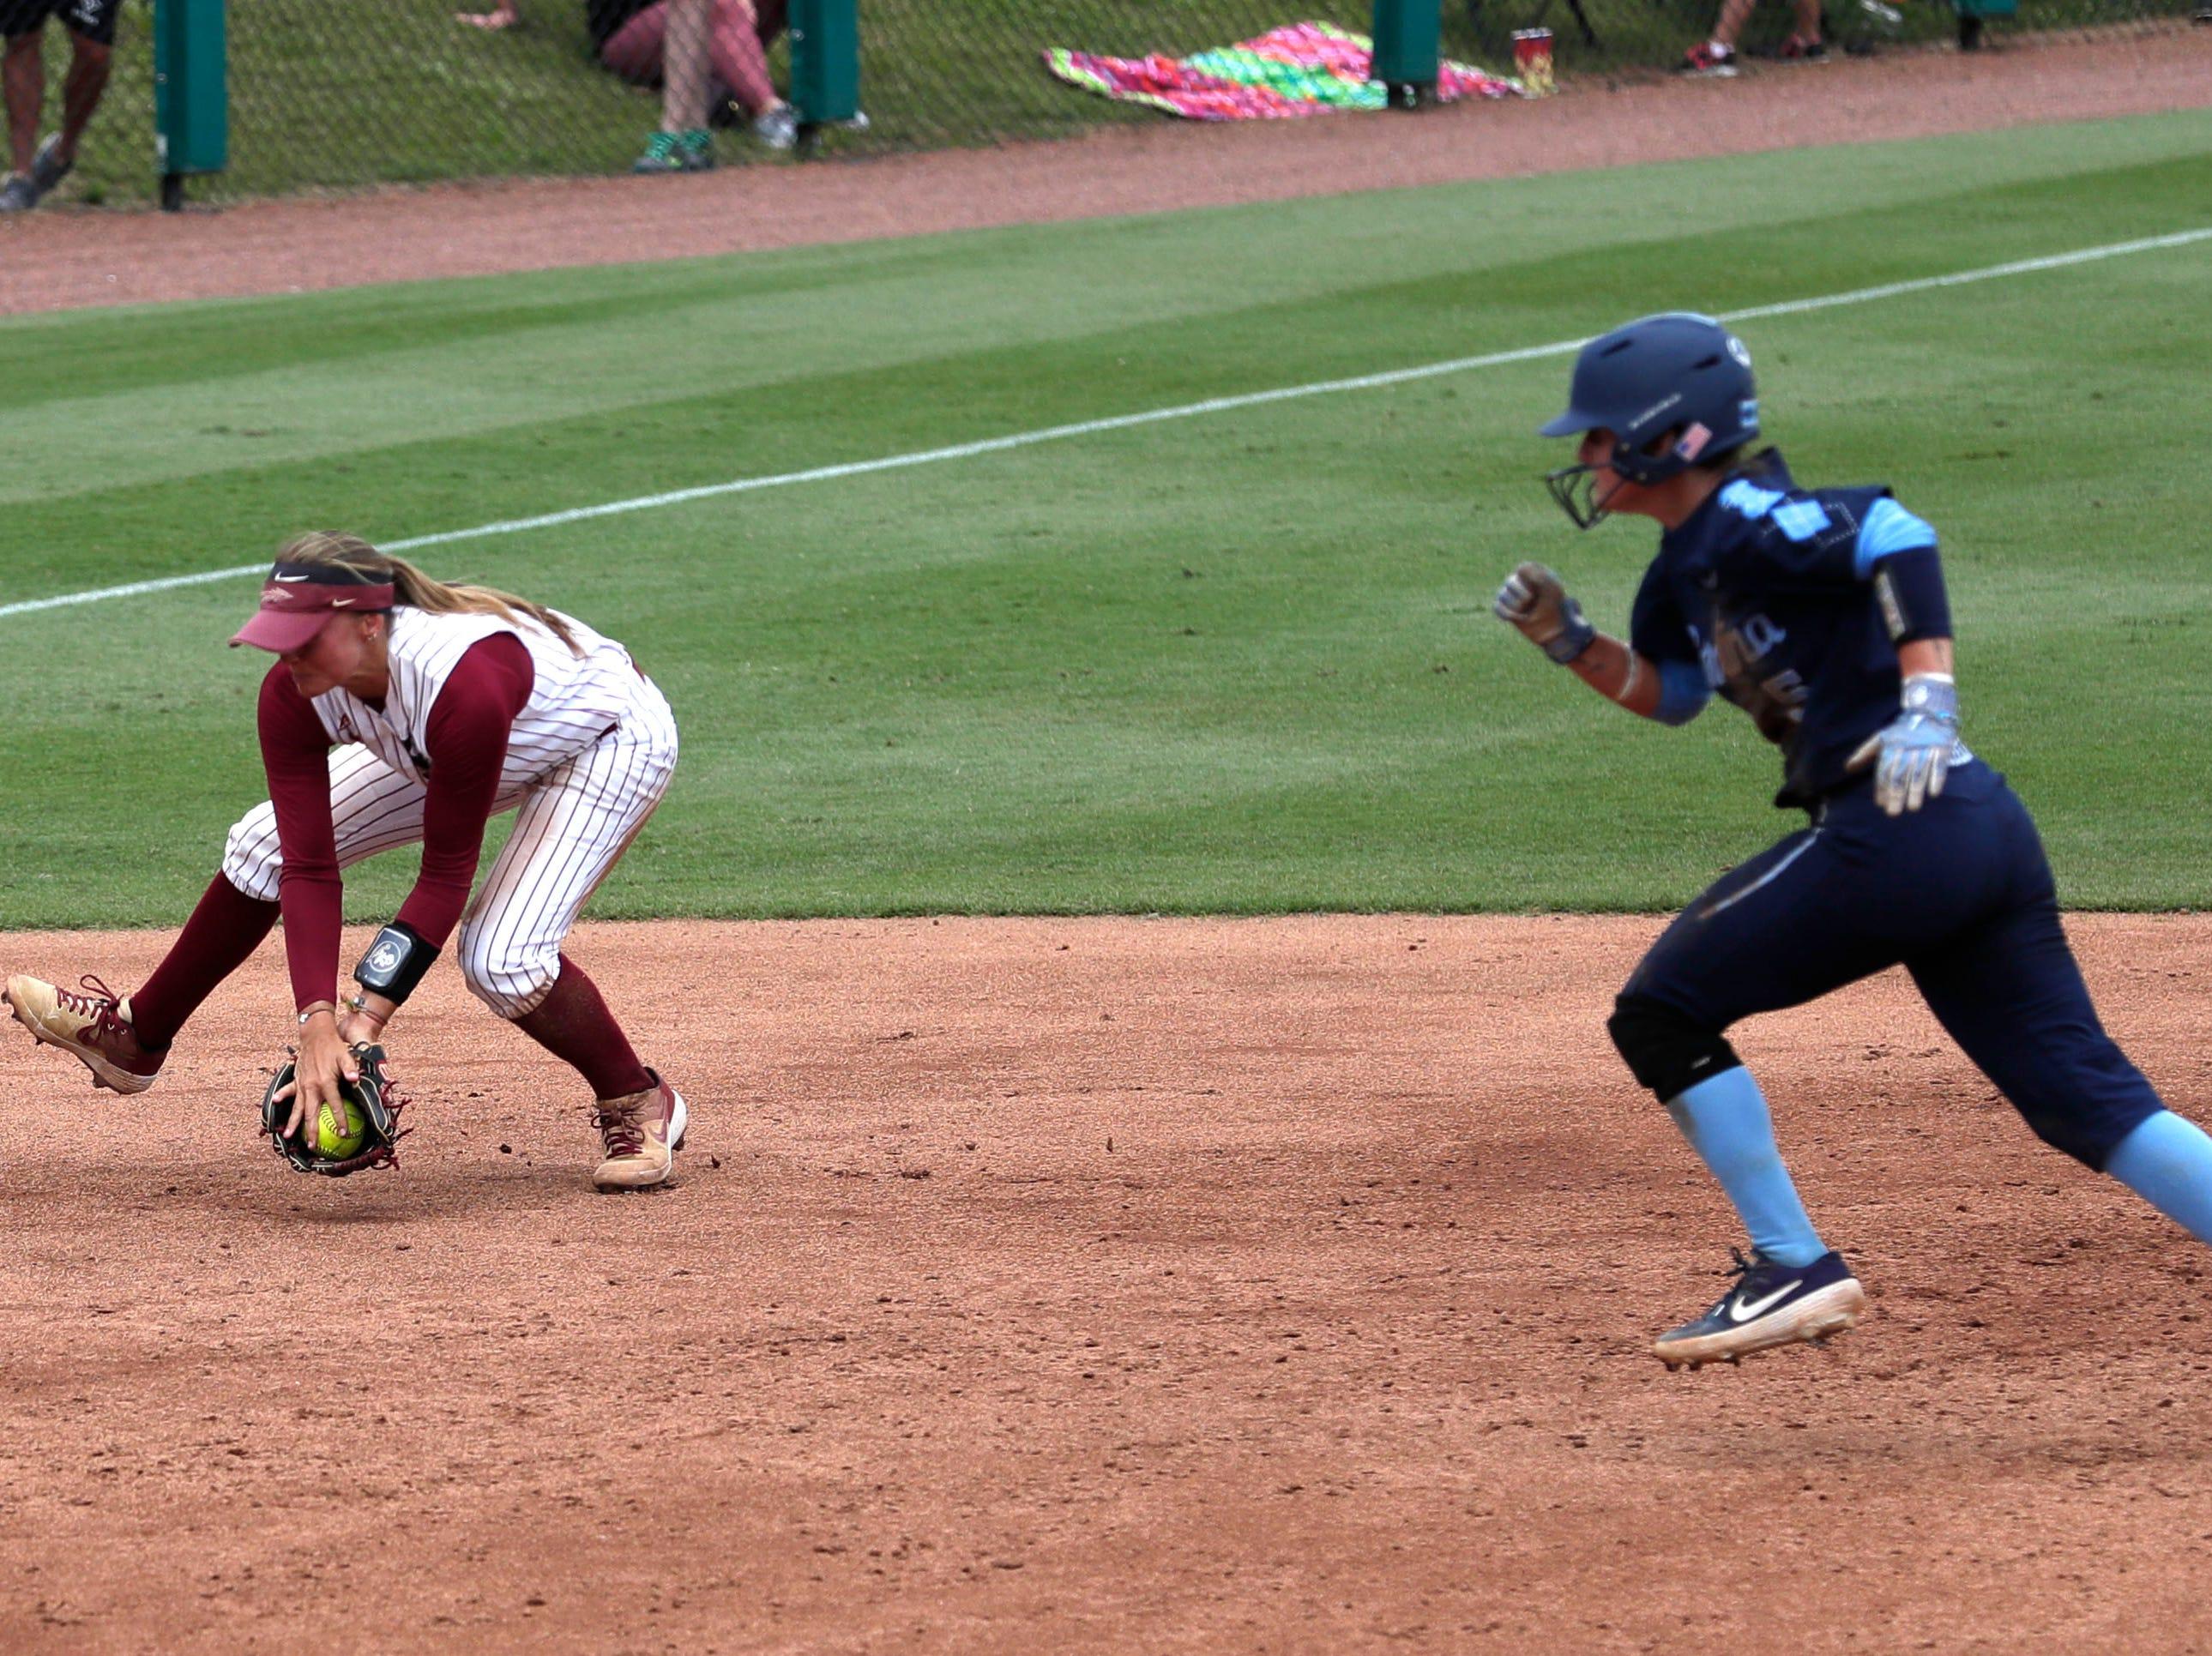 Florida State Seminoles infielder Cali Harrod (10) scoops up a ground ball. The Florida State Seminoles host the UNC Tar Heels for the ACC Softball Tournament finals Saturday, May 11, 2019.